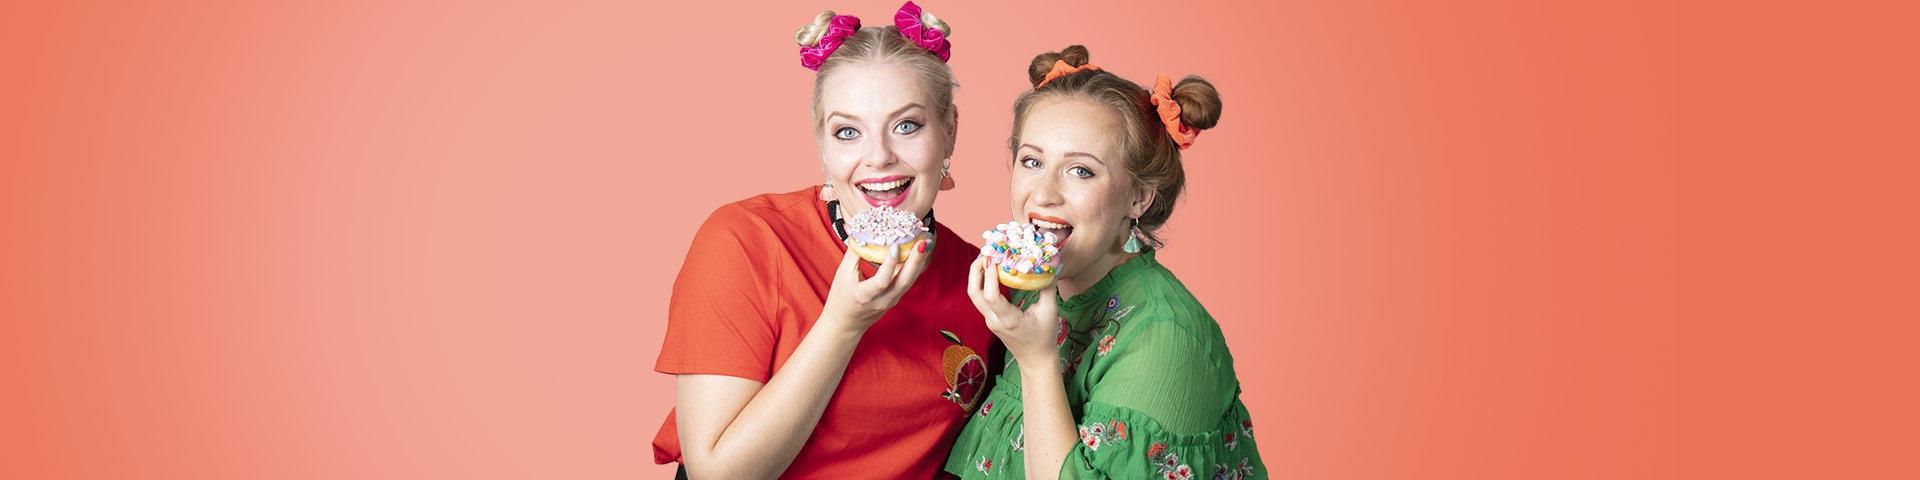 Feest en thema | Donuts + Bagels